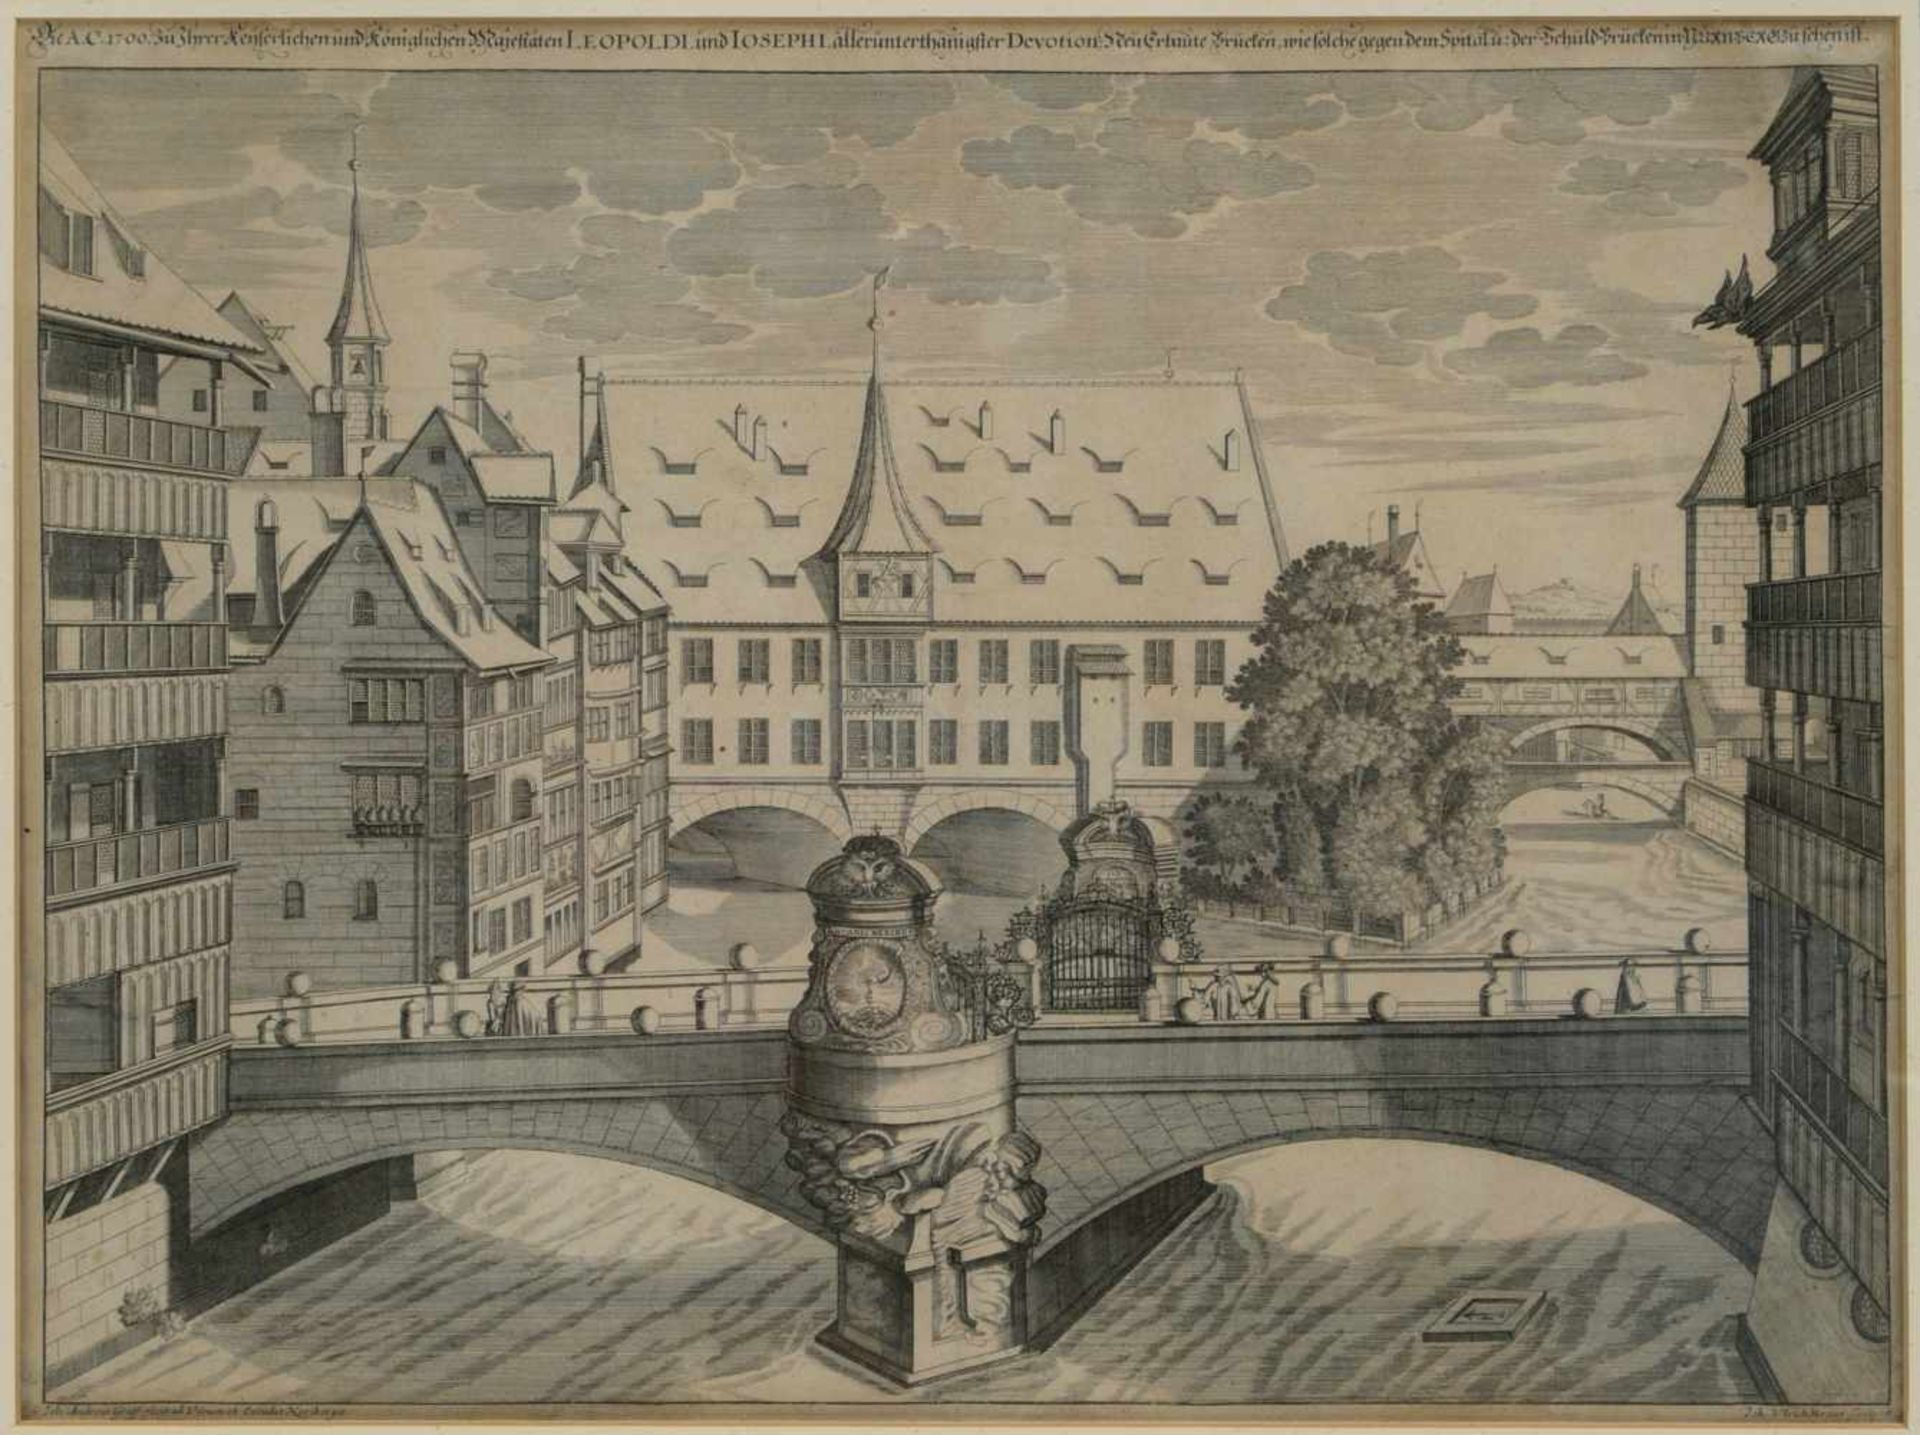 Los 19 - Graff, Johann Andras (1637-1701) - Die A. C. 1700 Neu Erbaute Brucken wie solche gegen dem Spital zu